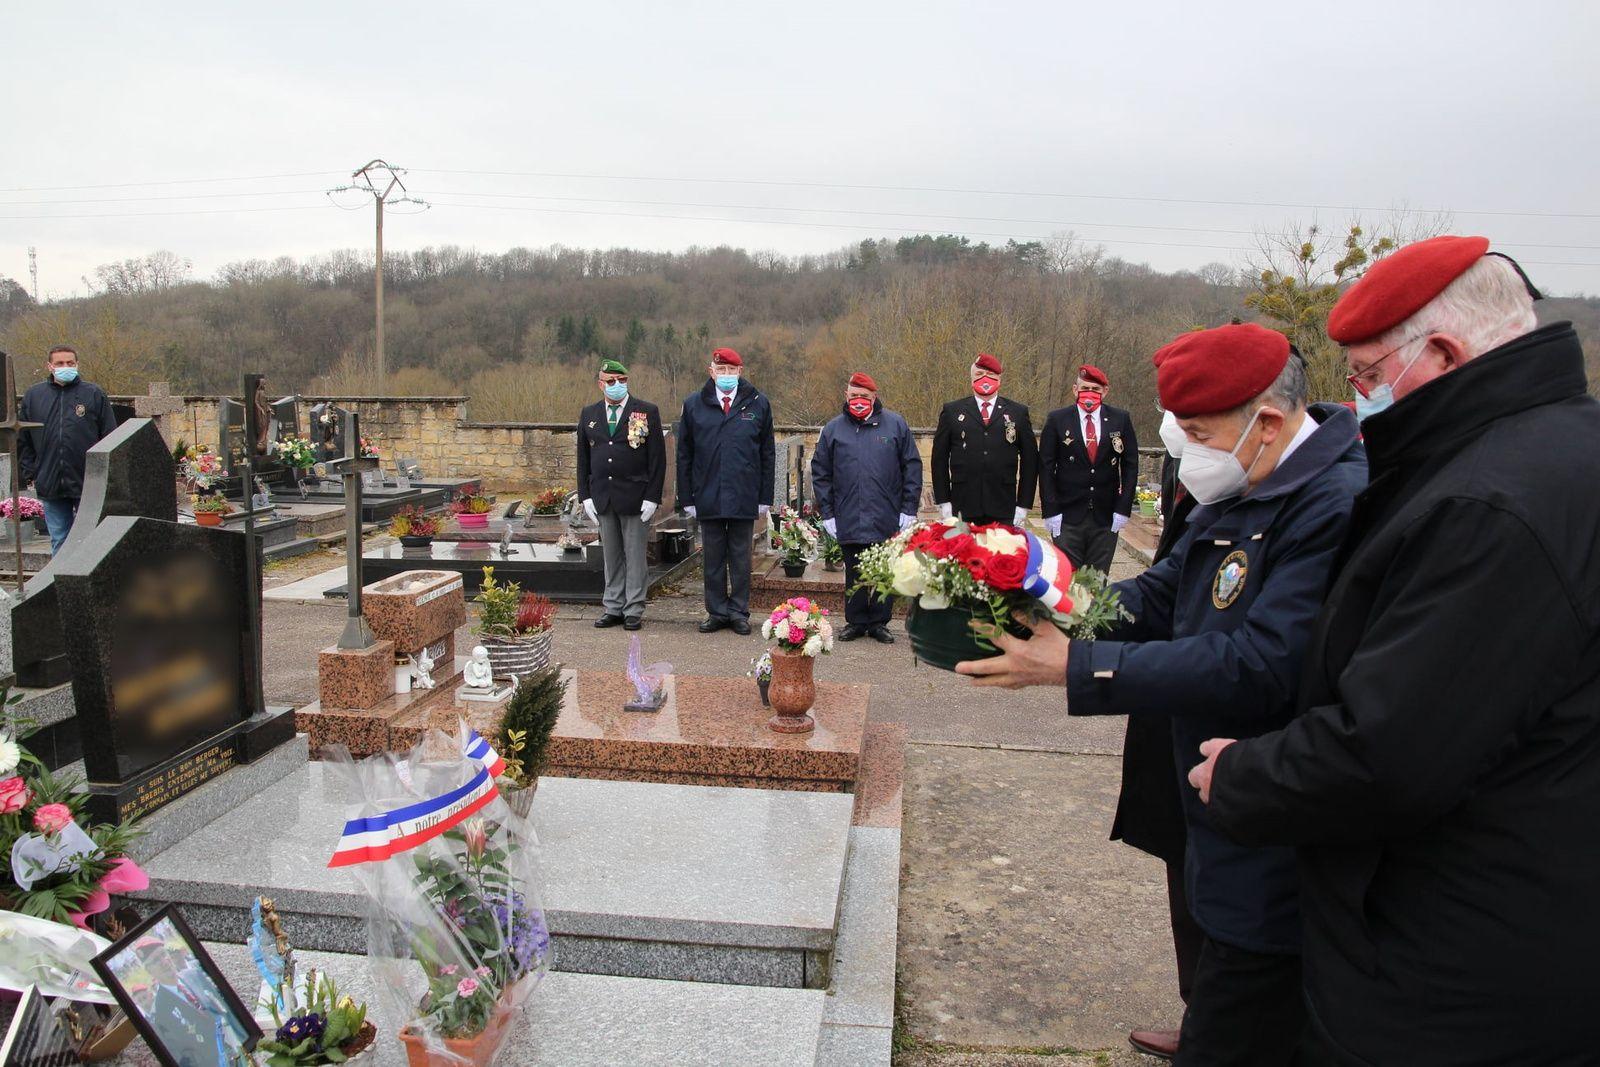 1 ANS DEJA  HOMMAGE  à NOTRE  PRESIDENT  GILBERT TRIESTINI  21 /03 / 2021